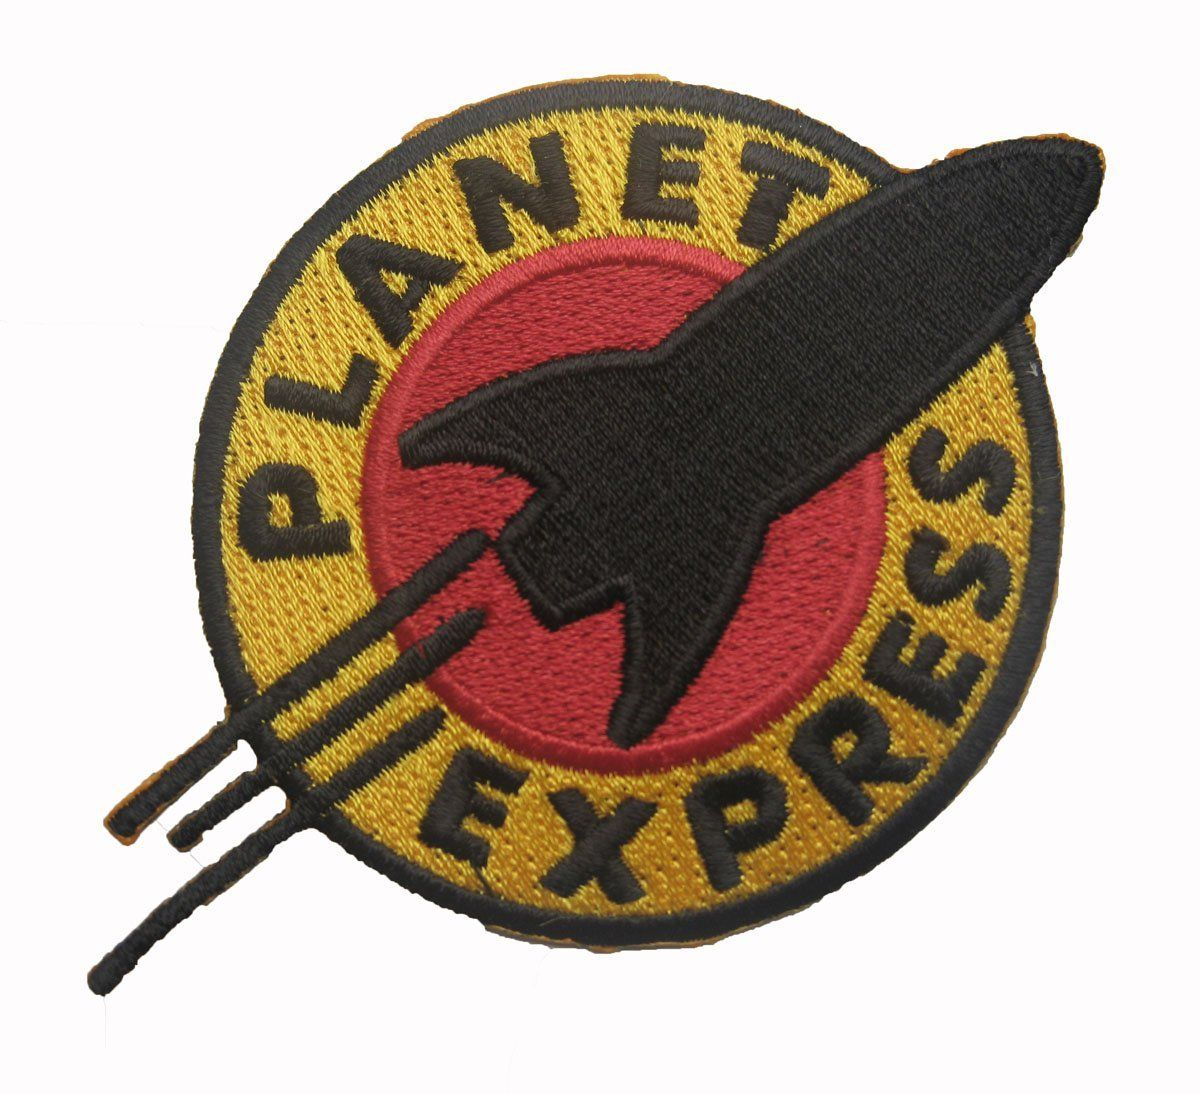 FUTURAMA The Express sew iron on Patch